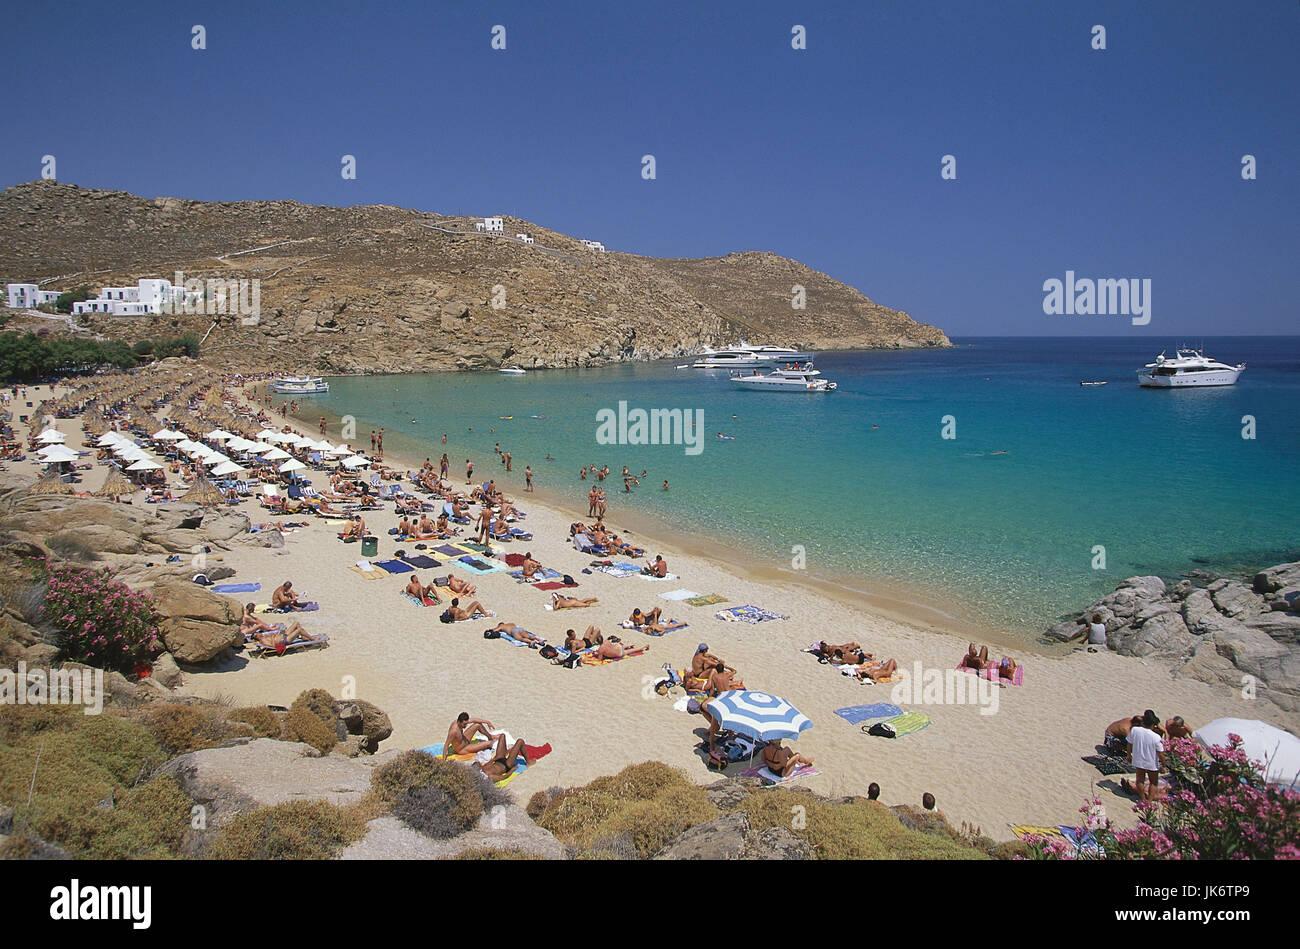 Griechenland, Kykladen, Insel Mykonos, Super Paradise Beach, Strandszene Mittelmeer, anregenden Calderafelsen, Cyclades, Stockbild